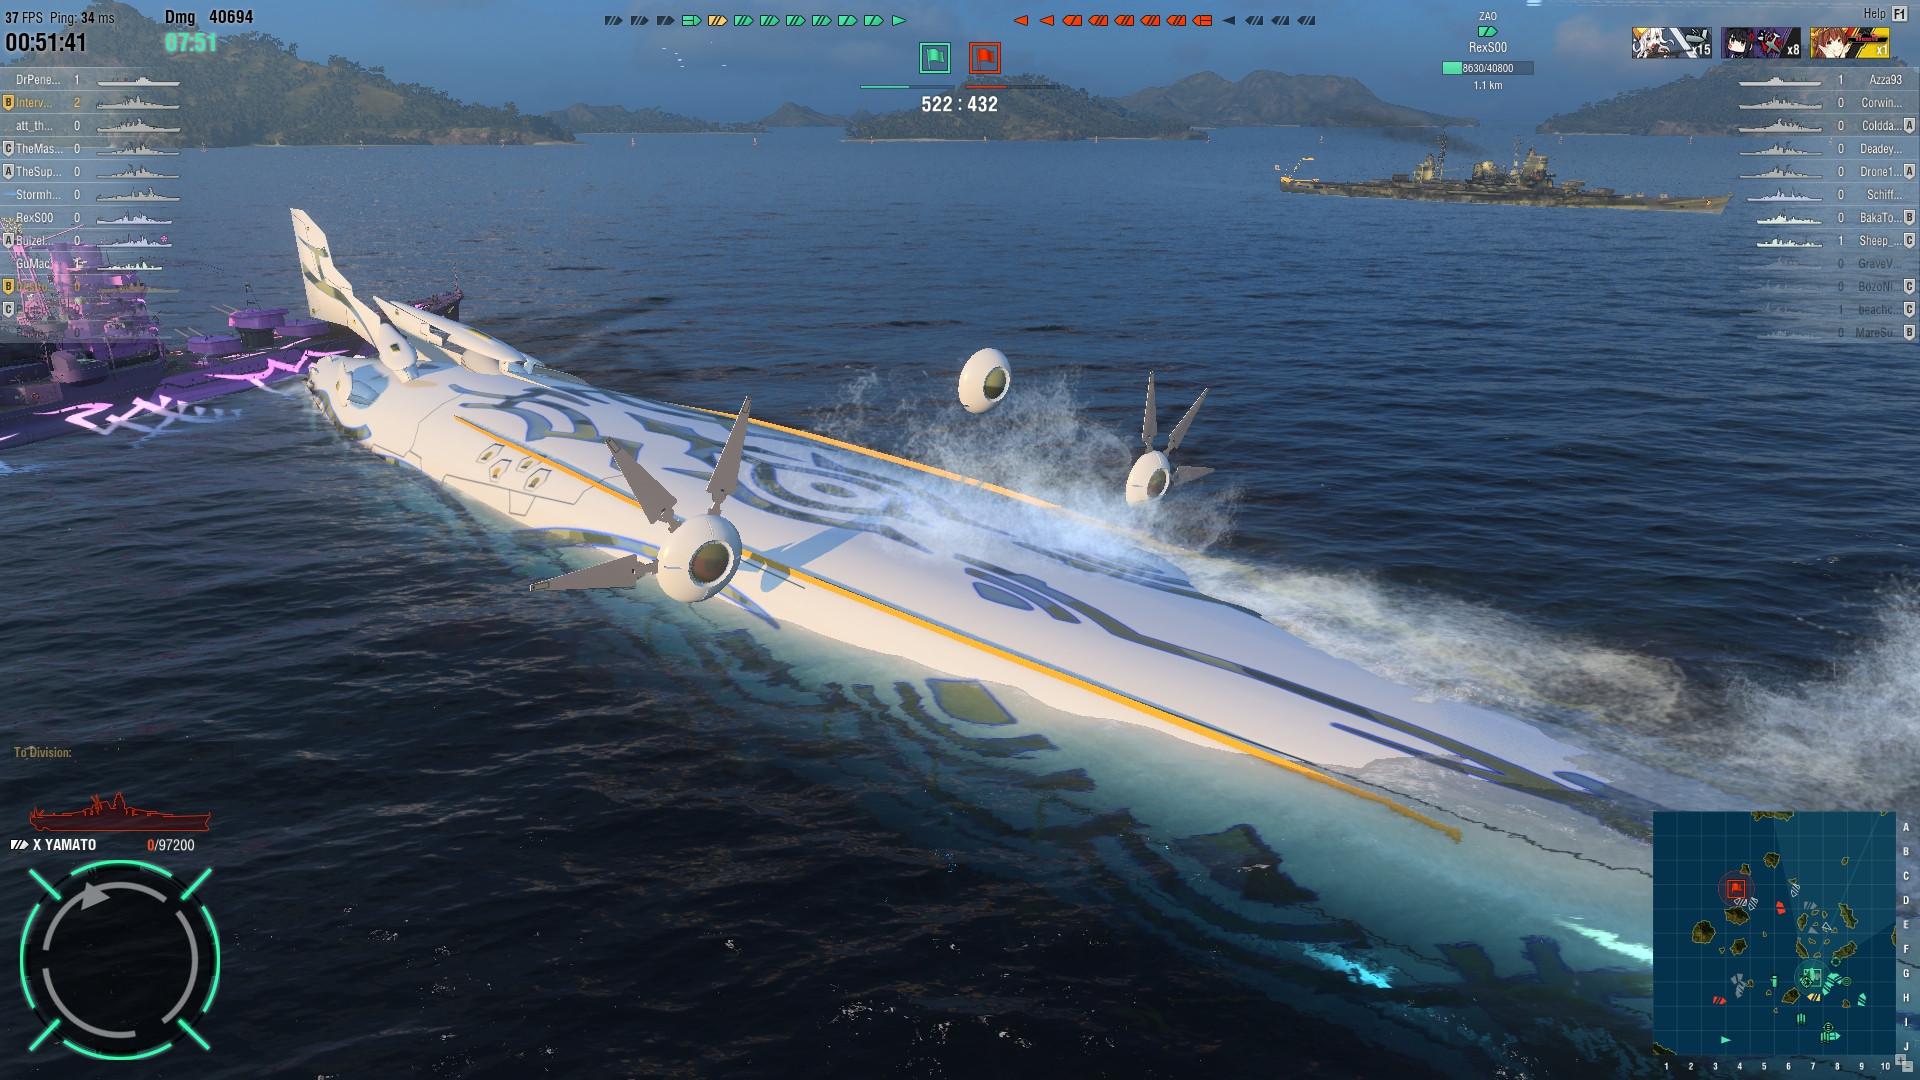 world of warships wallpaper hd